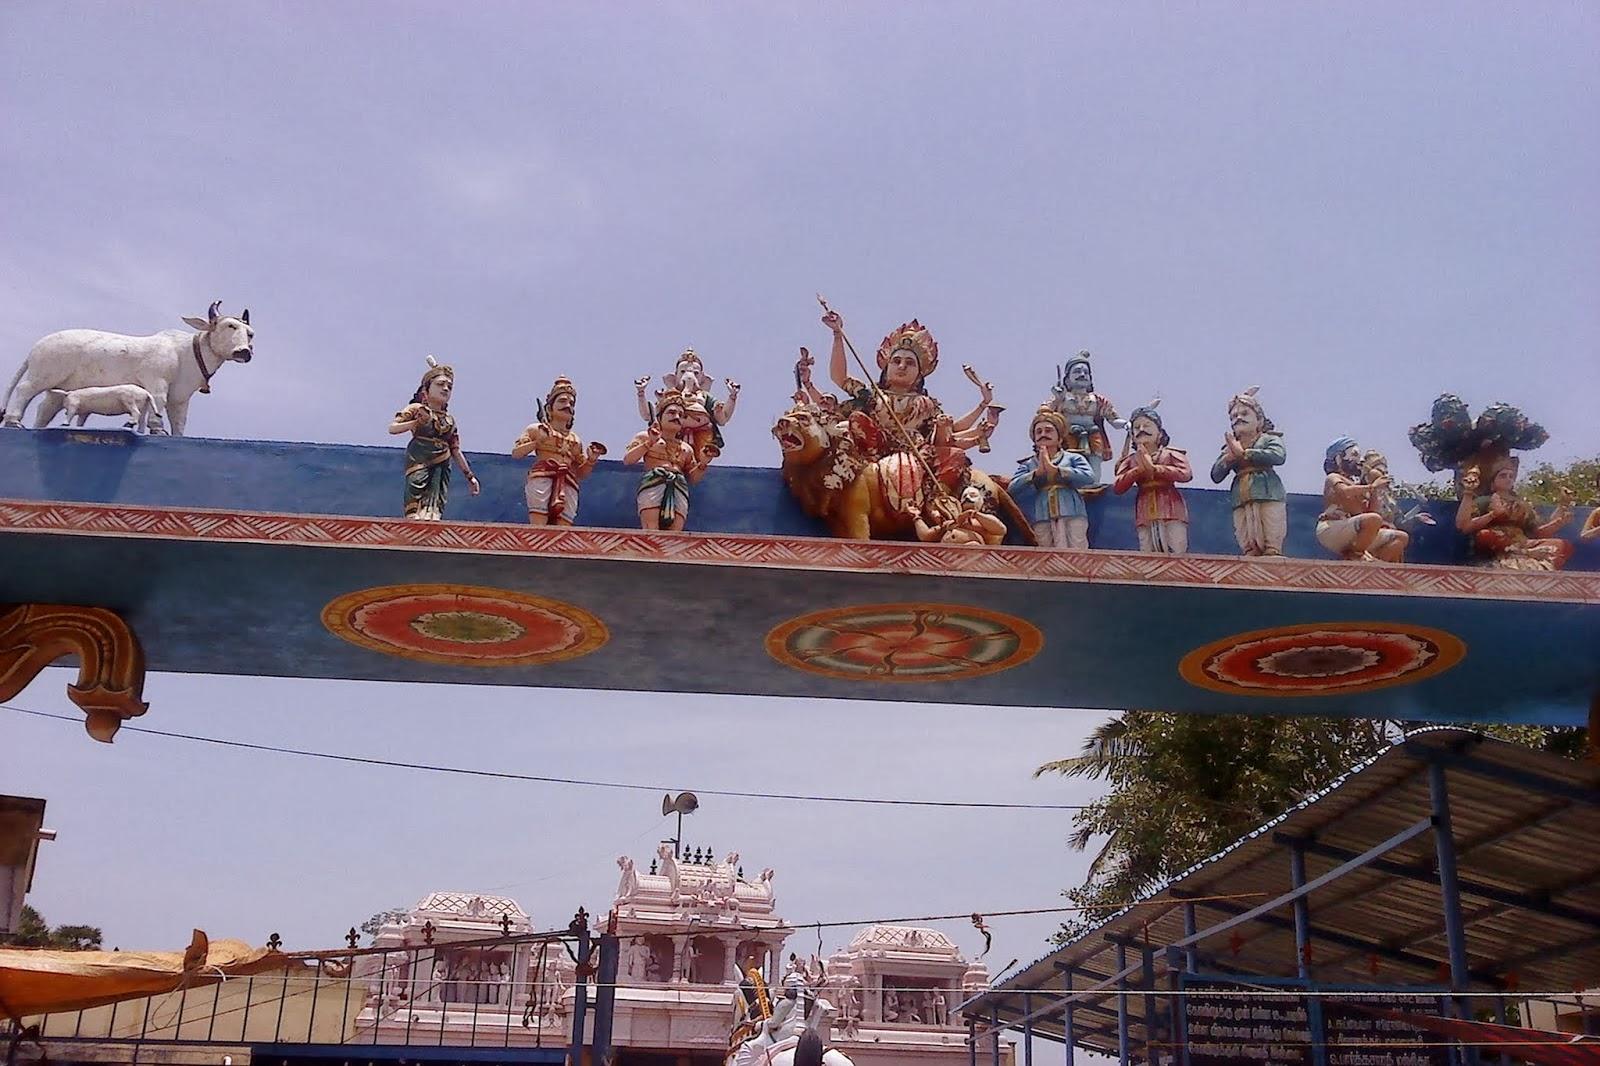 Tamilnadu Tourism: Madukkarai Chellandiamman Temple, Mayanur, Karur